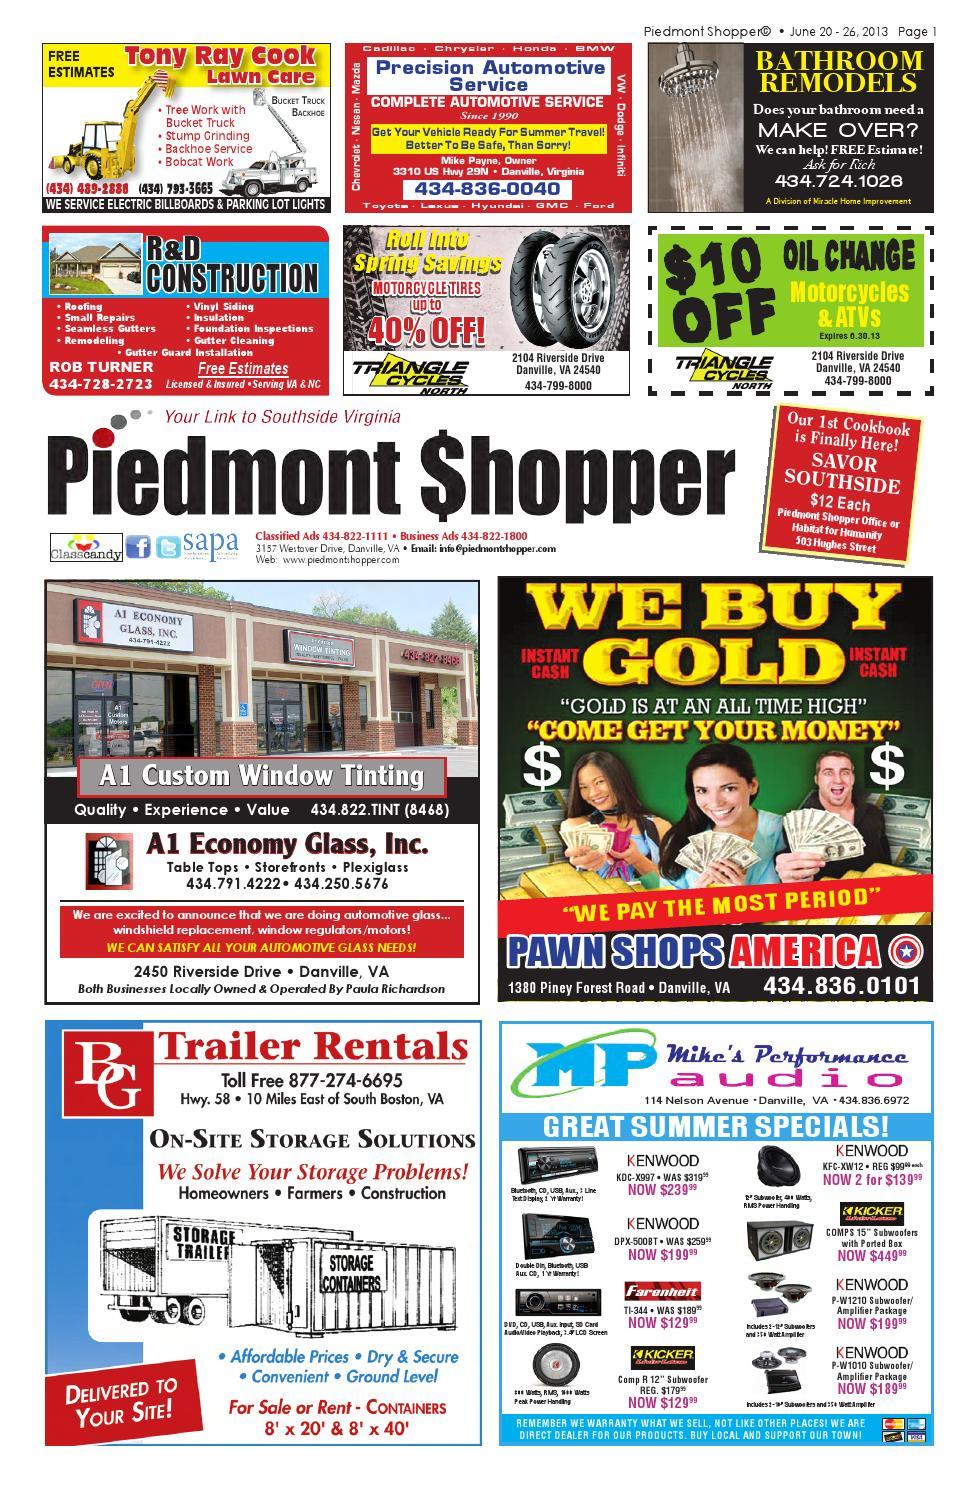 Piedmont Shopper 6 20 13 by piedmont shopper - issuu